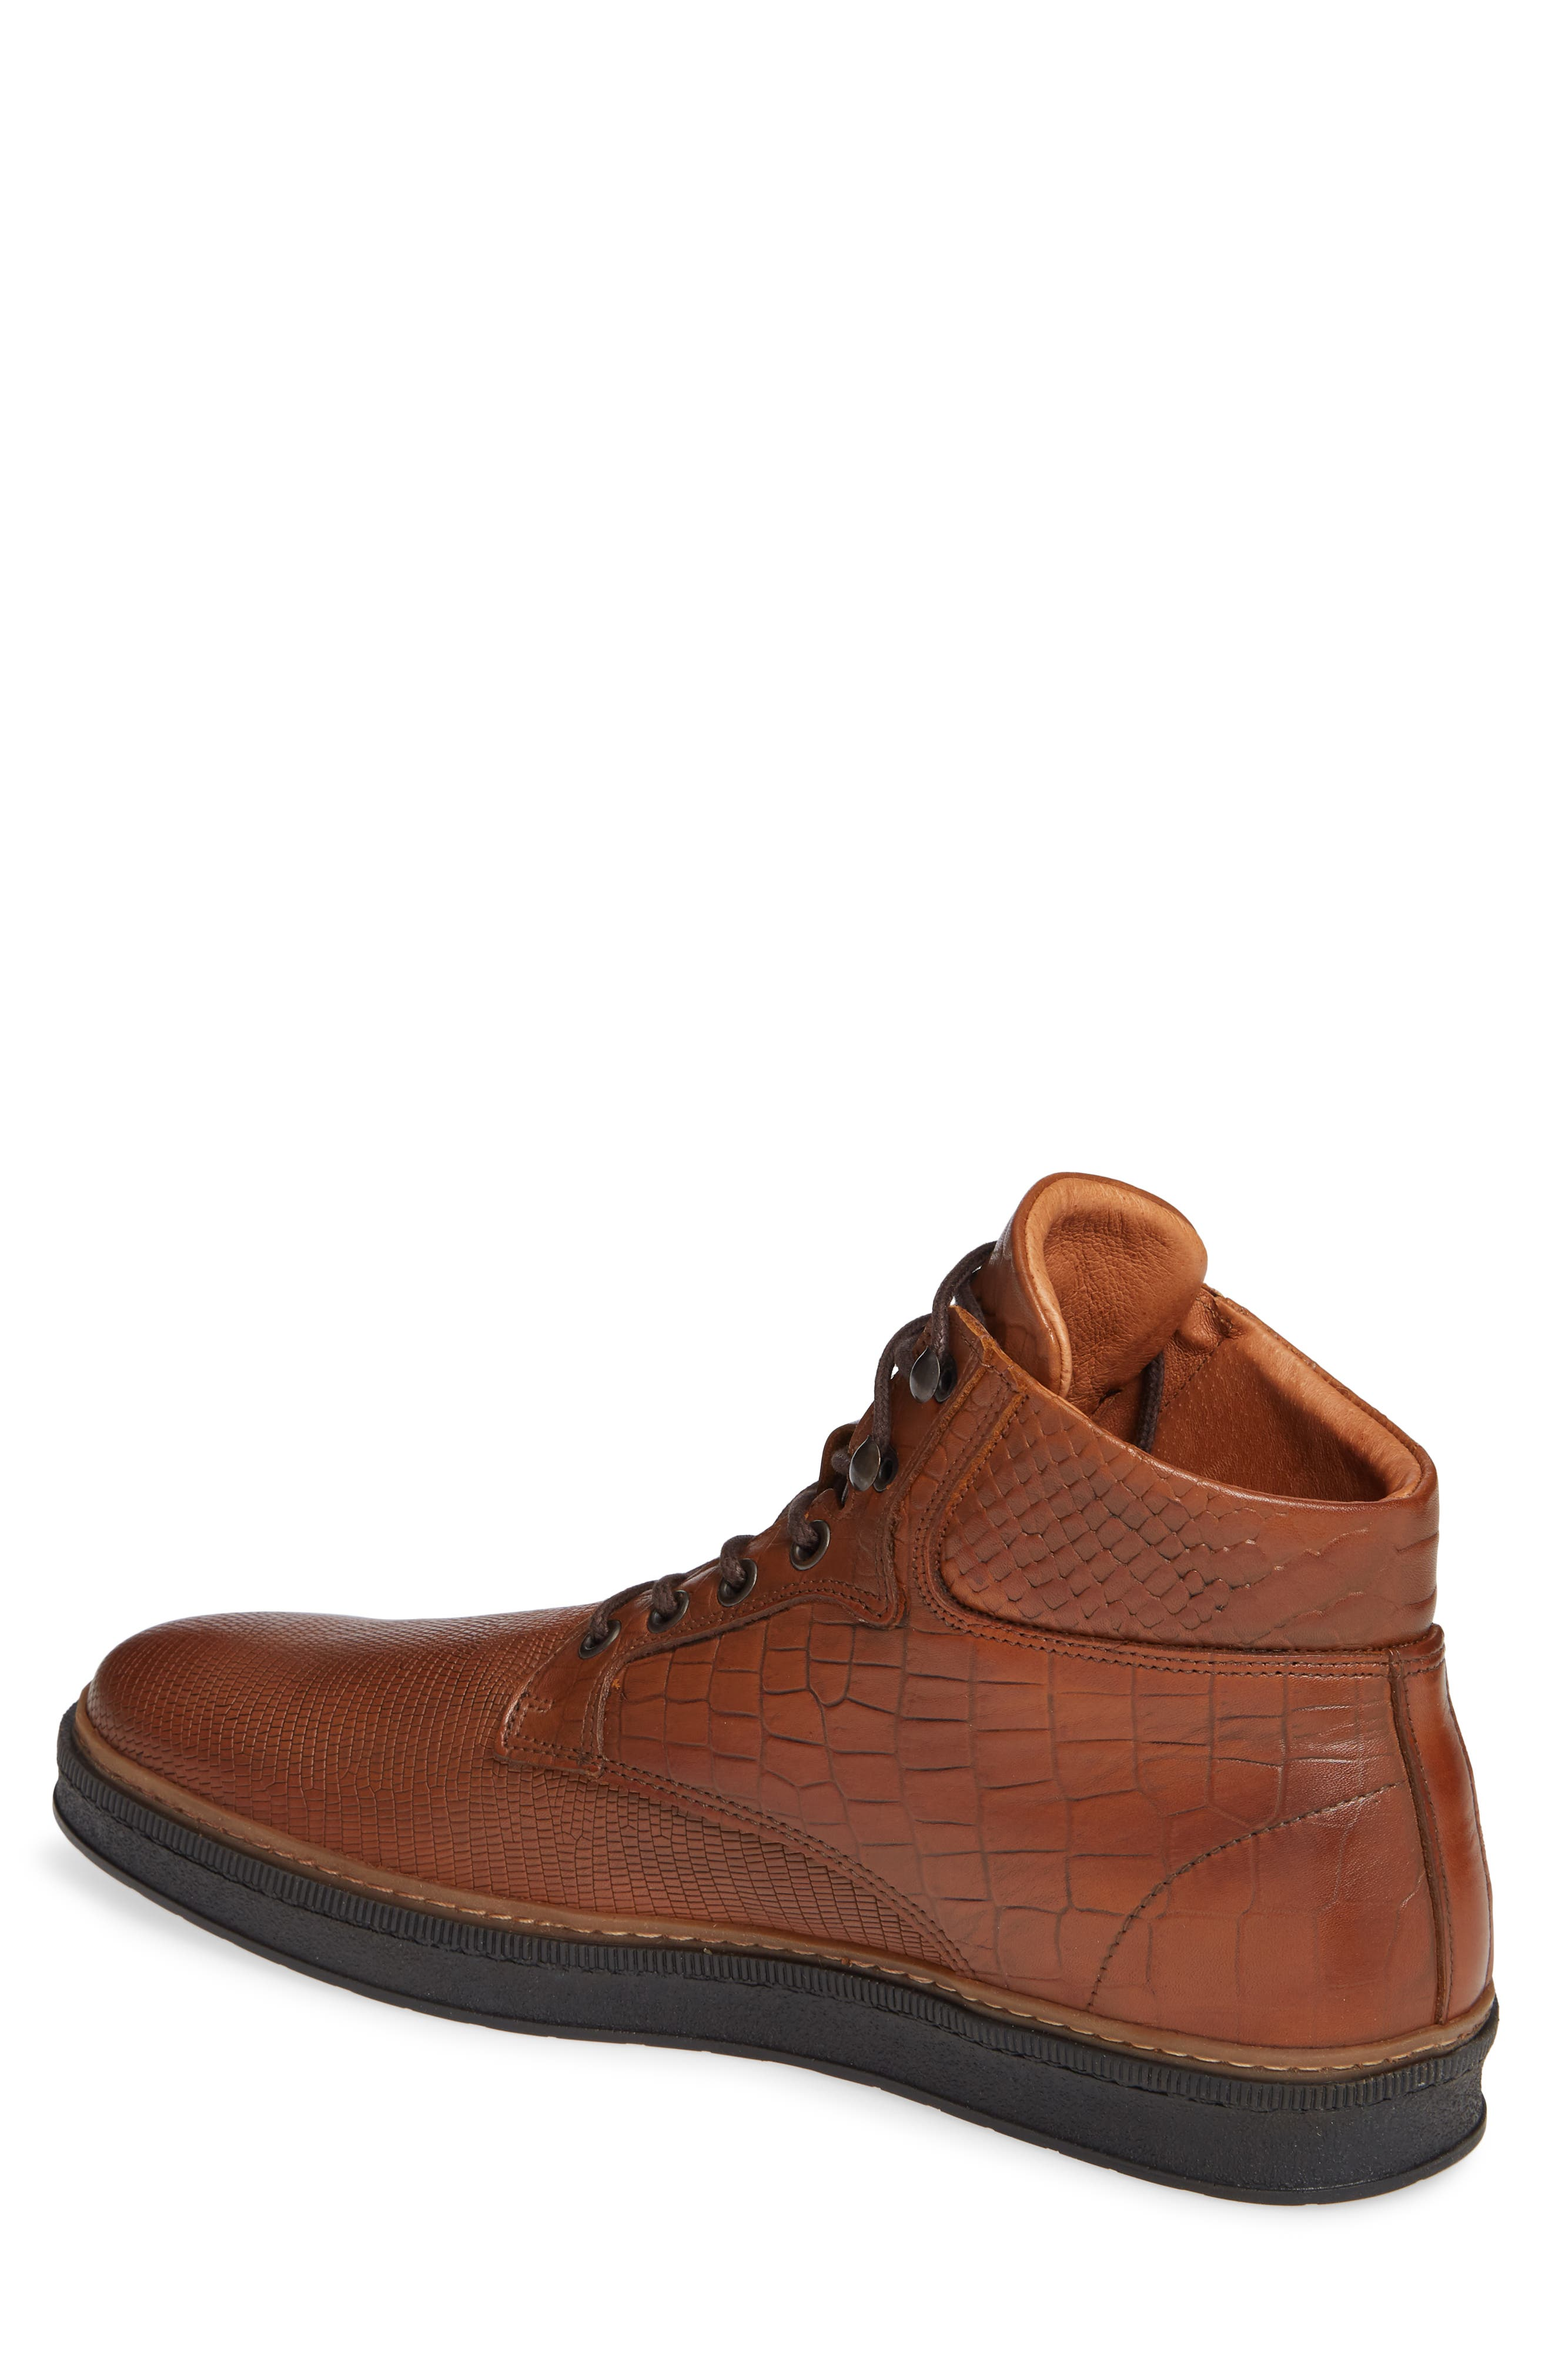 Lissabon Sneaker,                             Alternate thumbnail 2, color,                             DARK COGNAC